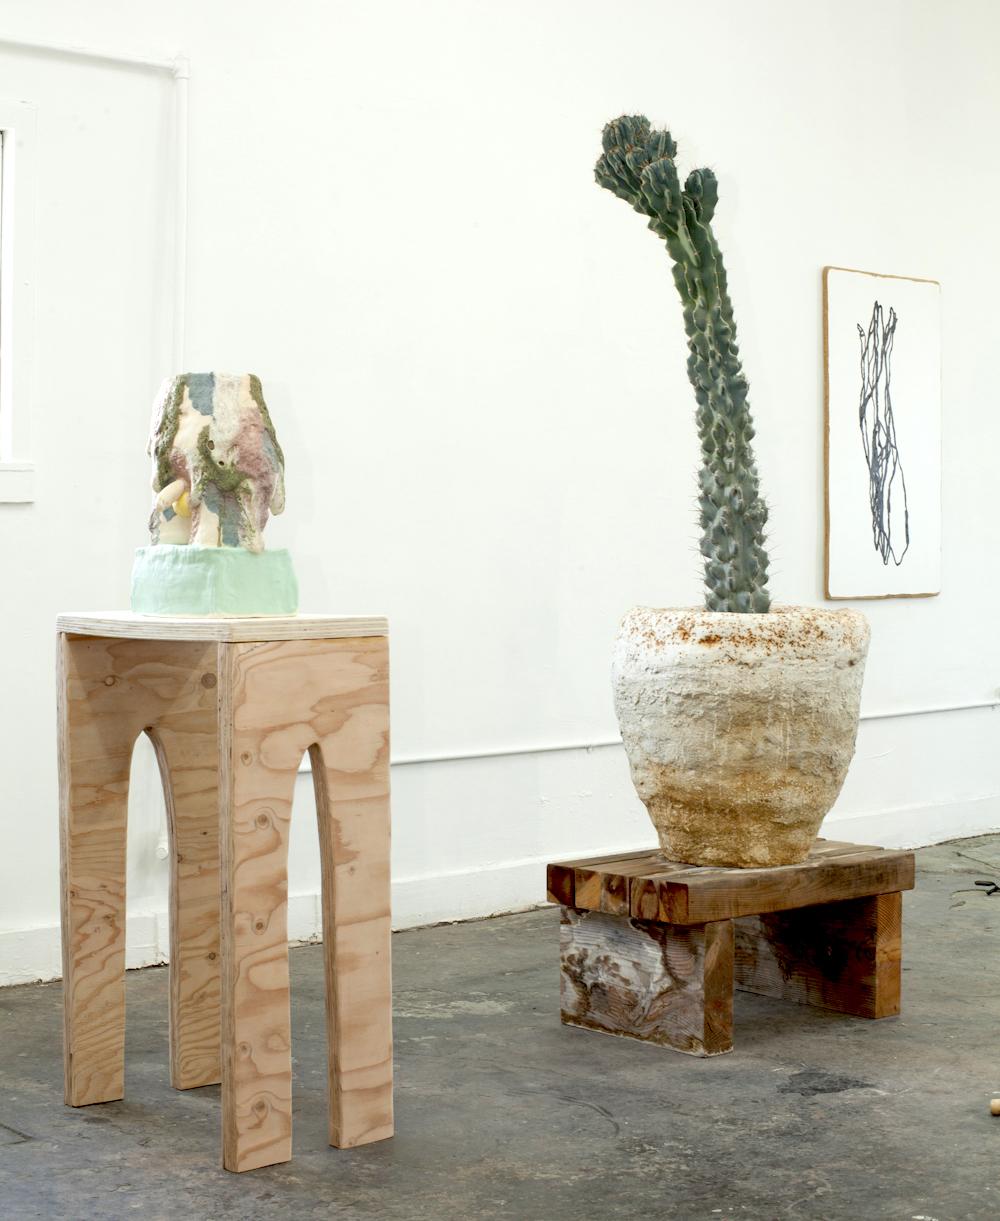 (Left to Right) Alice Lang, Better Half 2, 2017,  Lava glaze on ceramic w/ plywood base   |   John Zappas, Big John Pot, 2017, Hydracal and redwood base